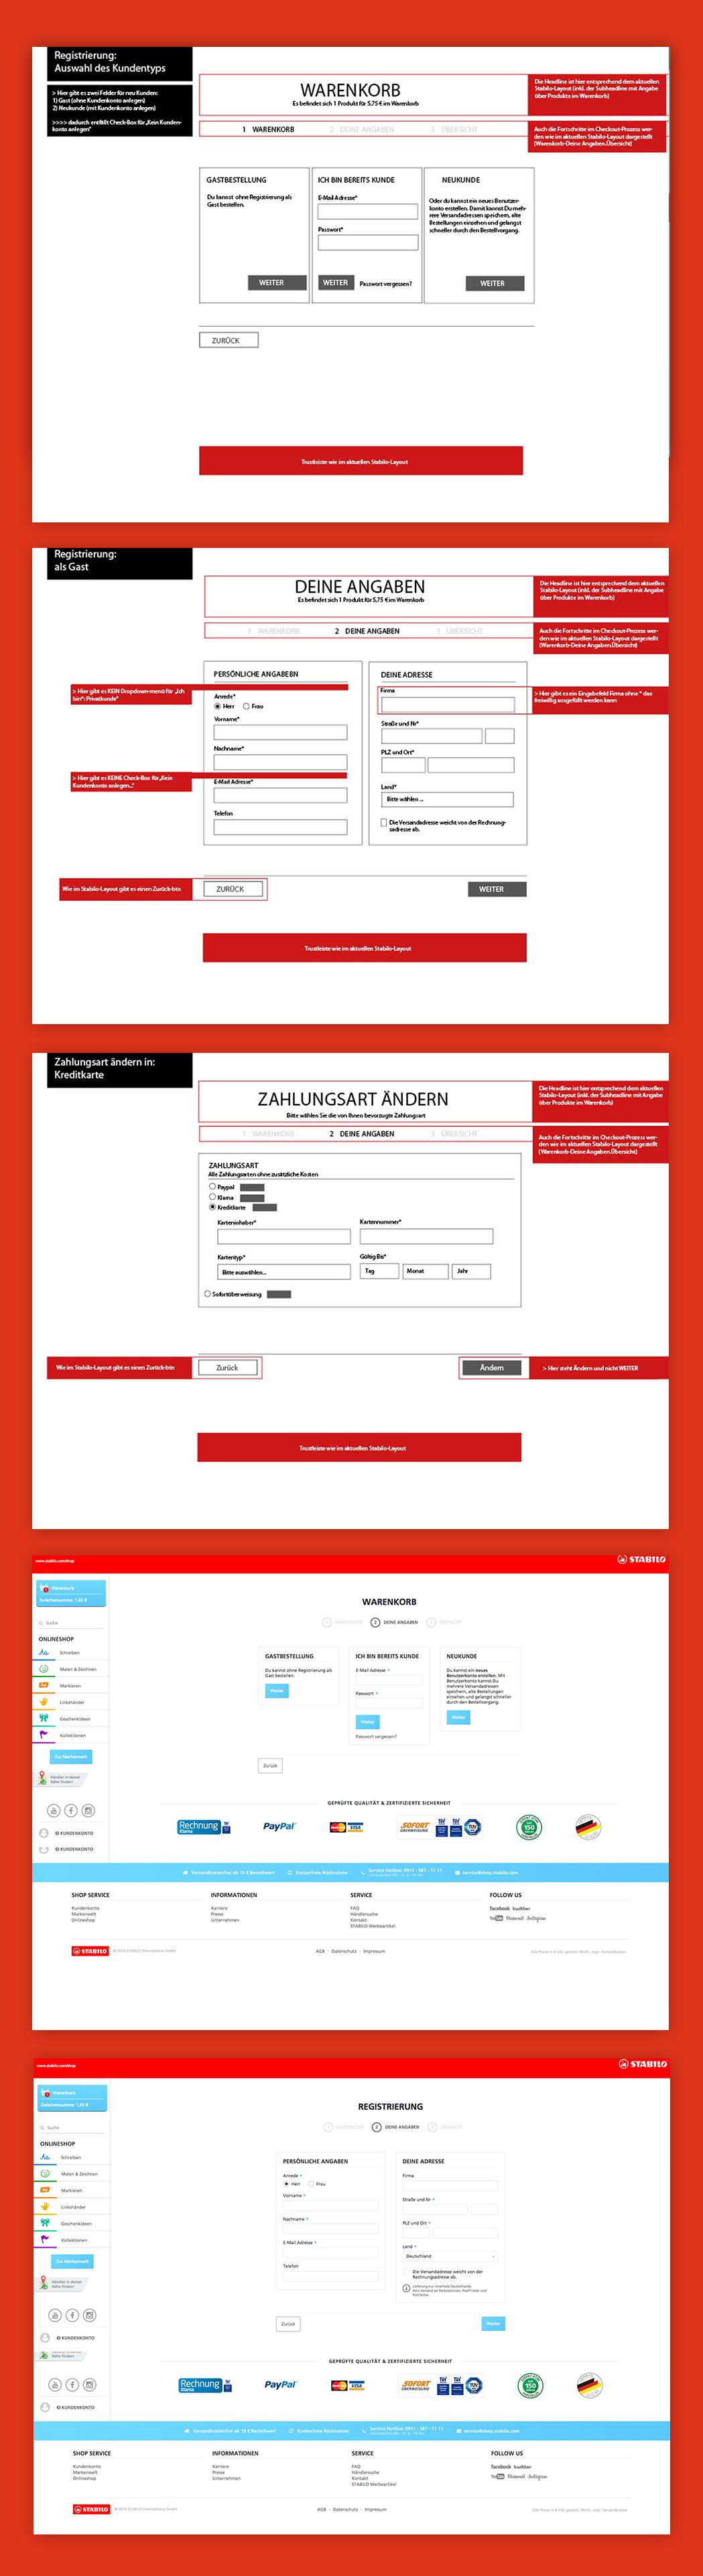 MaritaHeinzelmann_UX_UI_Design_Usability_Stabilo_Checkout